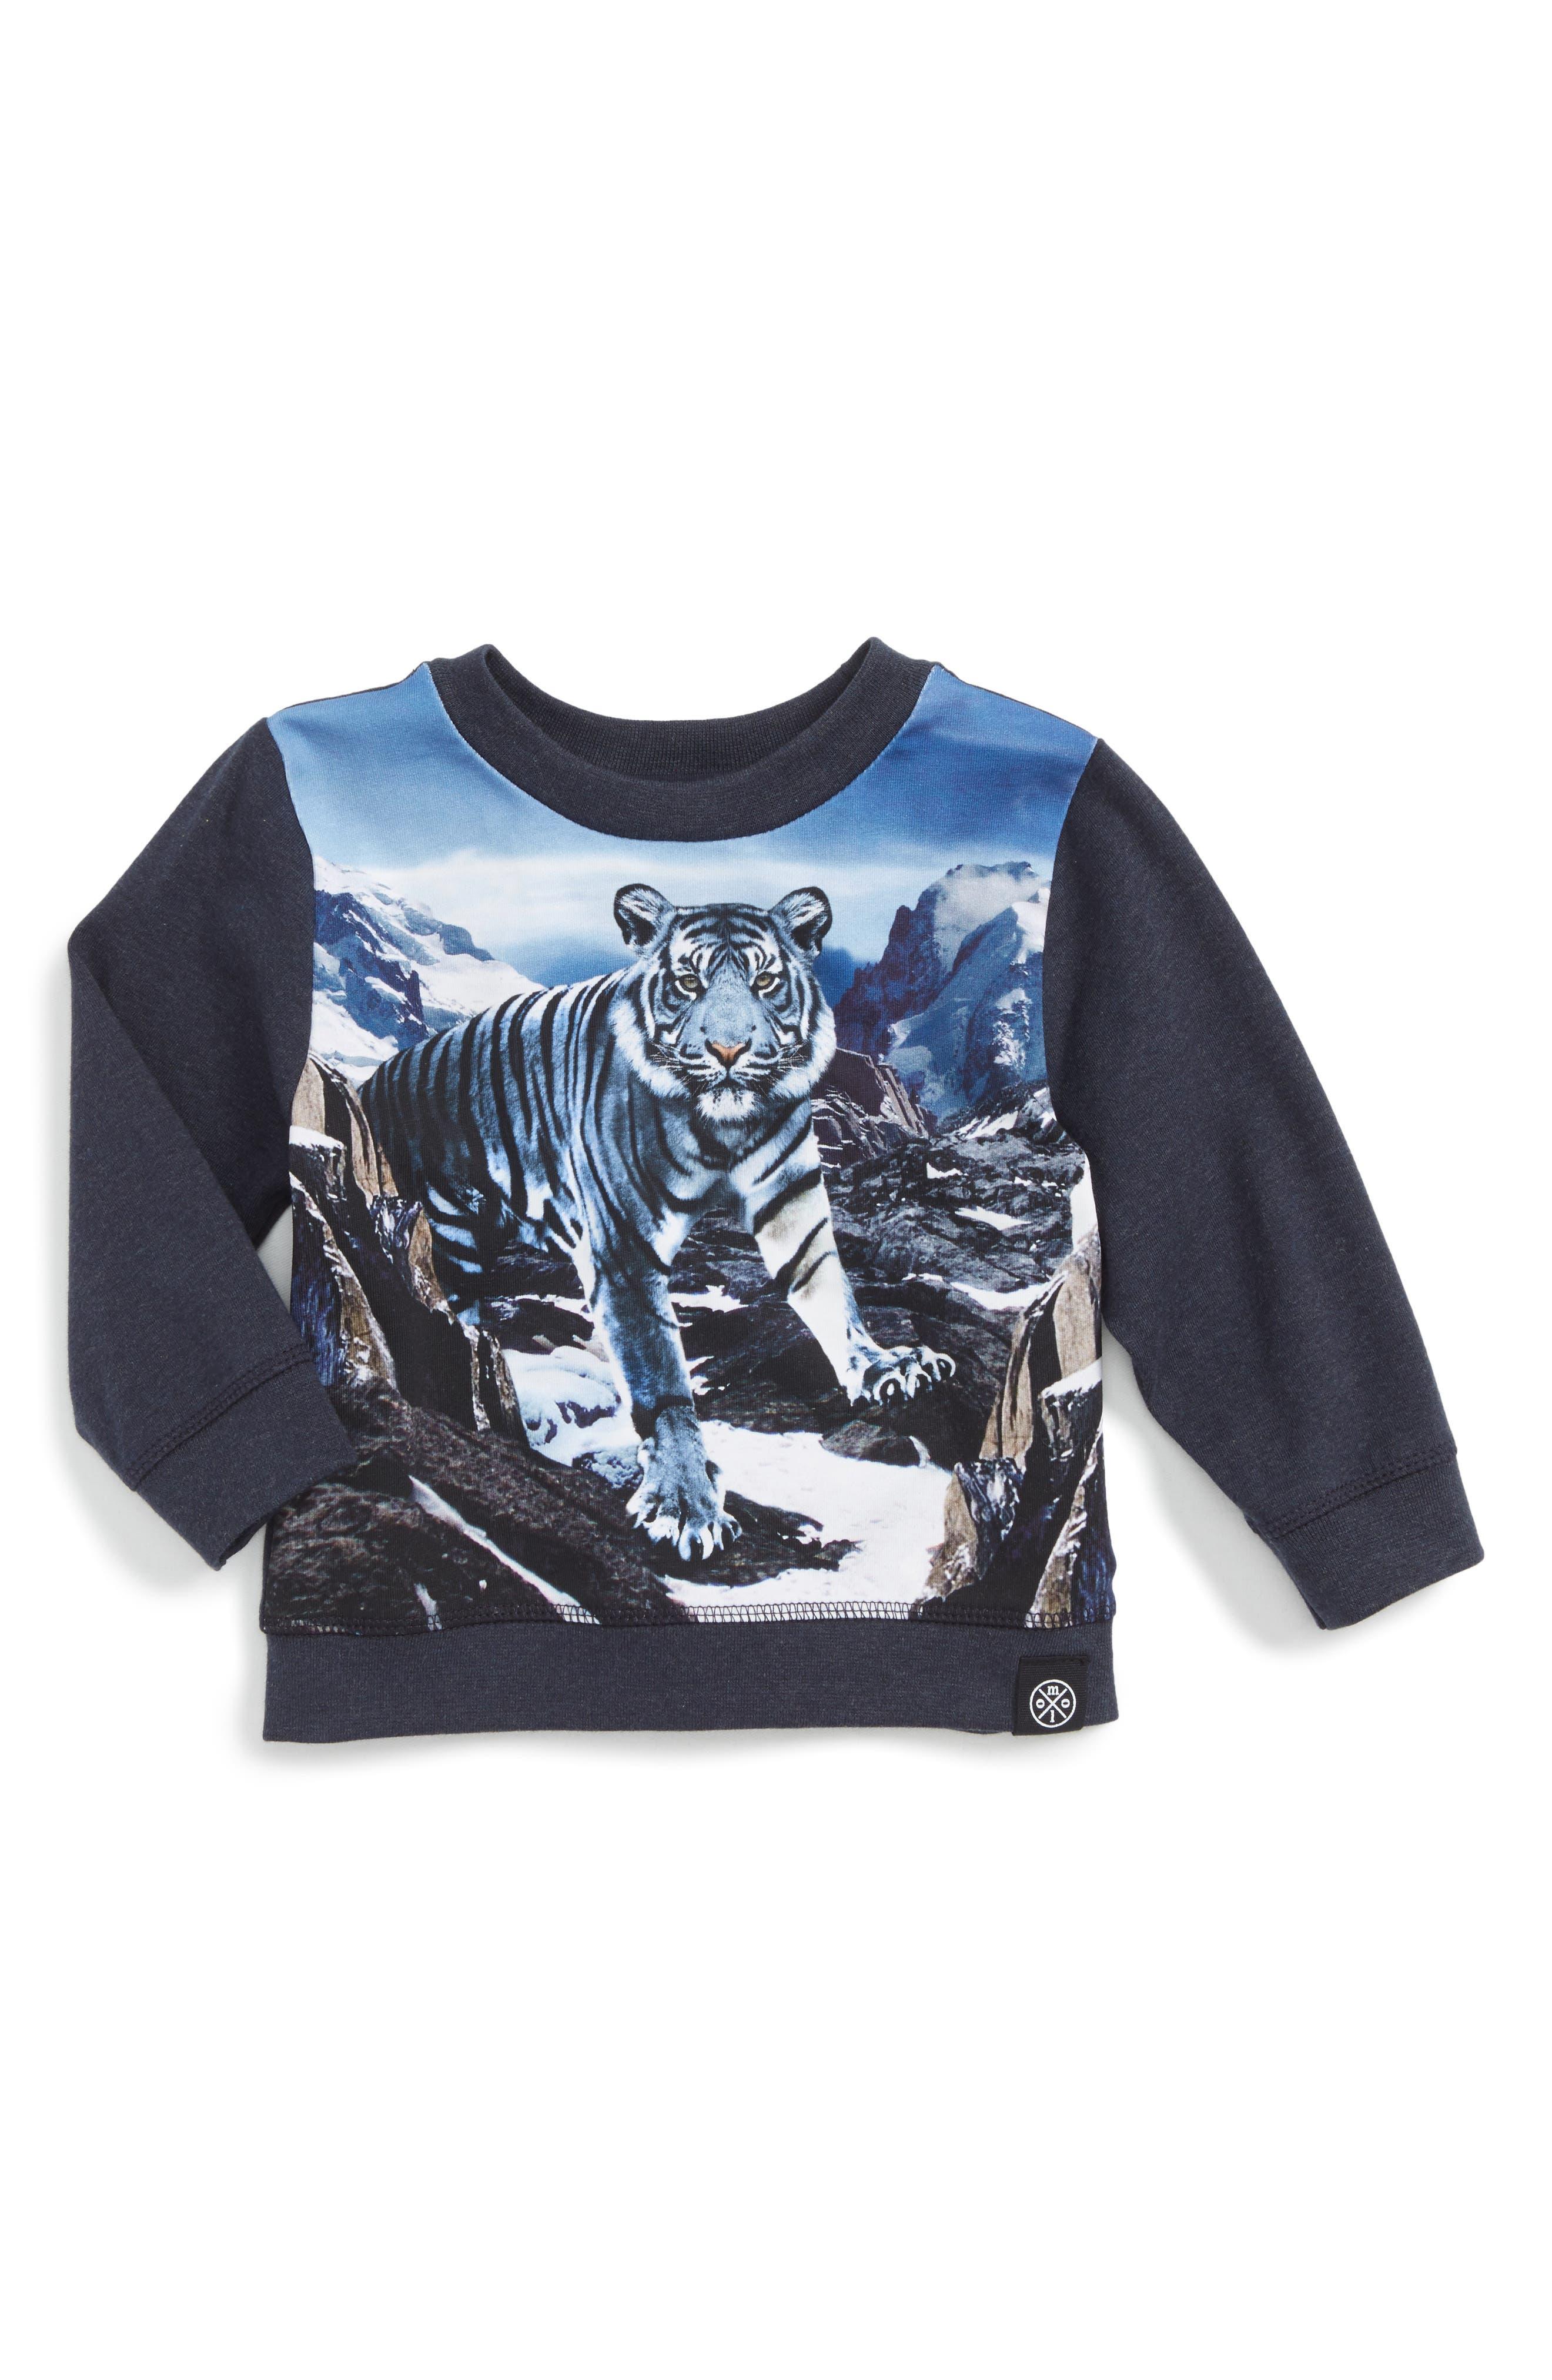 Main Image - Molo Tiger Graphic T-Shirt (Baby Boys)